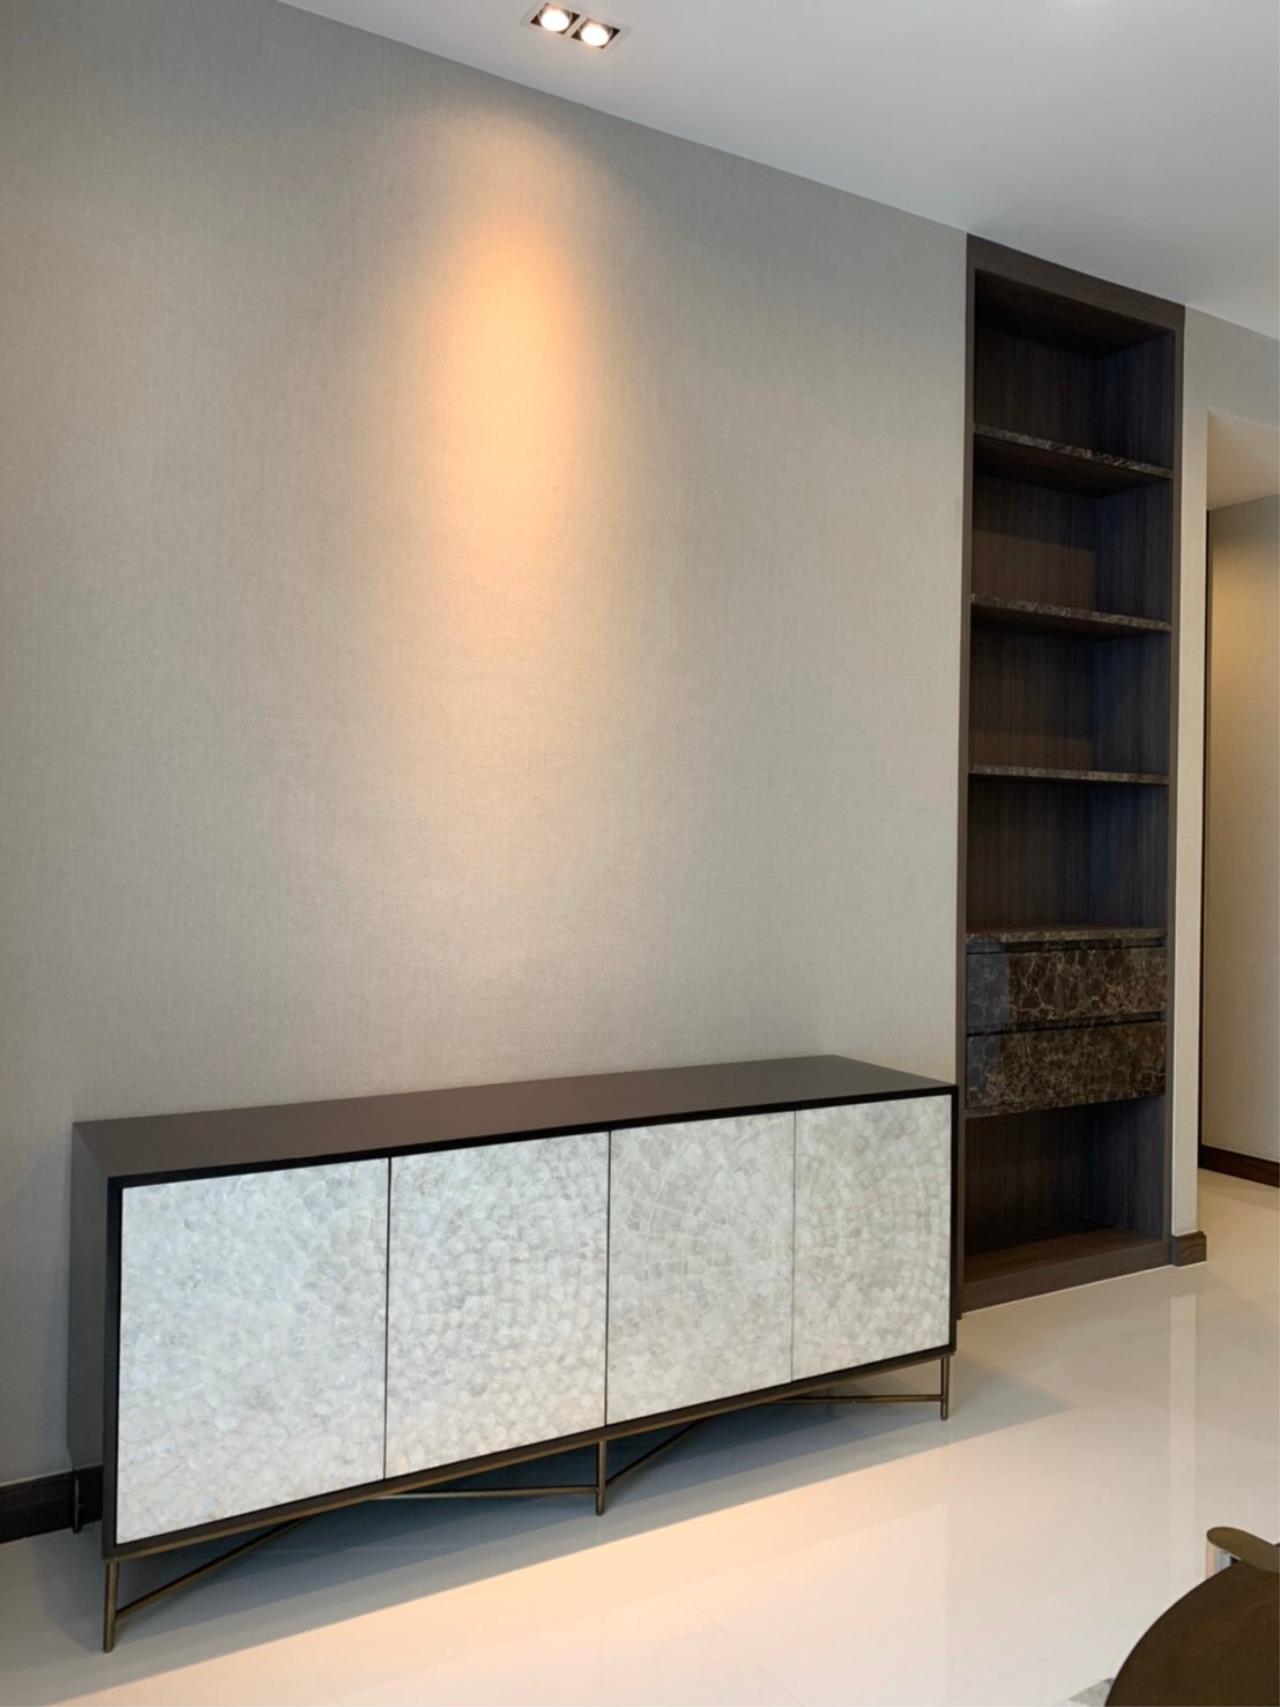 Bestbkkcondos Agency's Q sukhumvit at BTSnana - 92sqm - For Rent : 90 000 / month - 2 Bedrooms 9